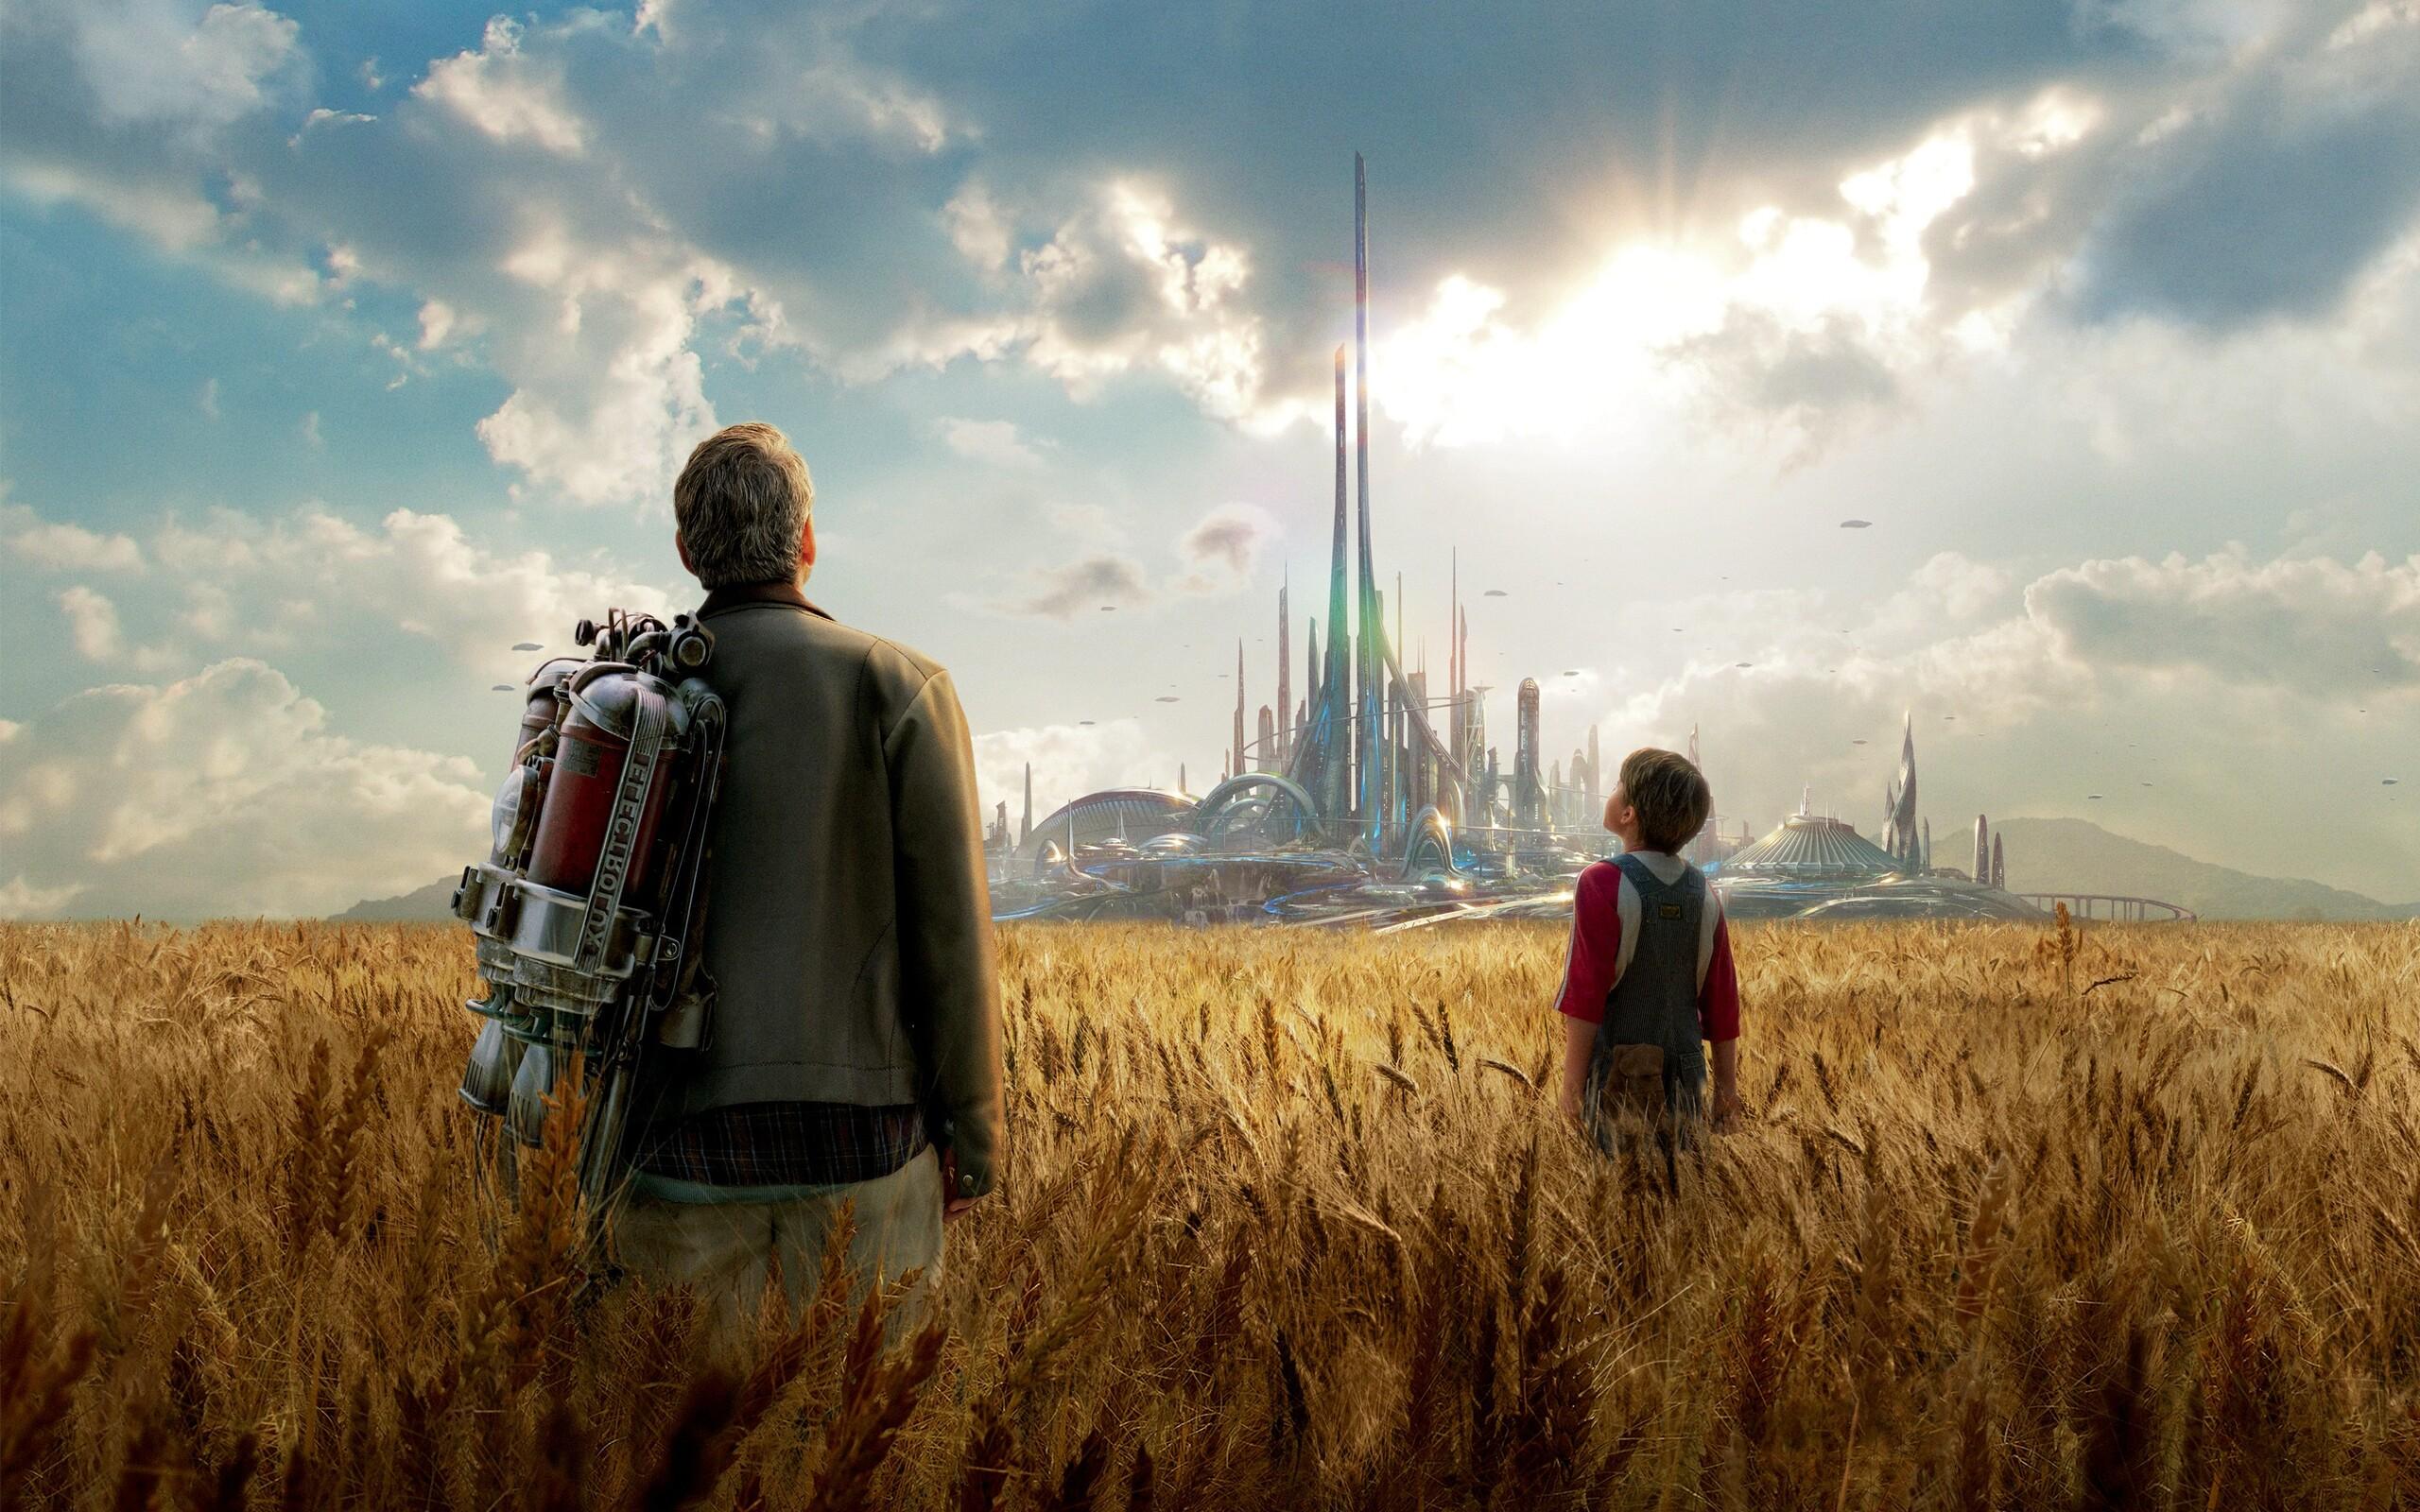 2560x1600 Tomorrowland Movie 3 2560x1600 Resolution Hd 4k